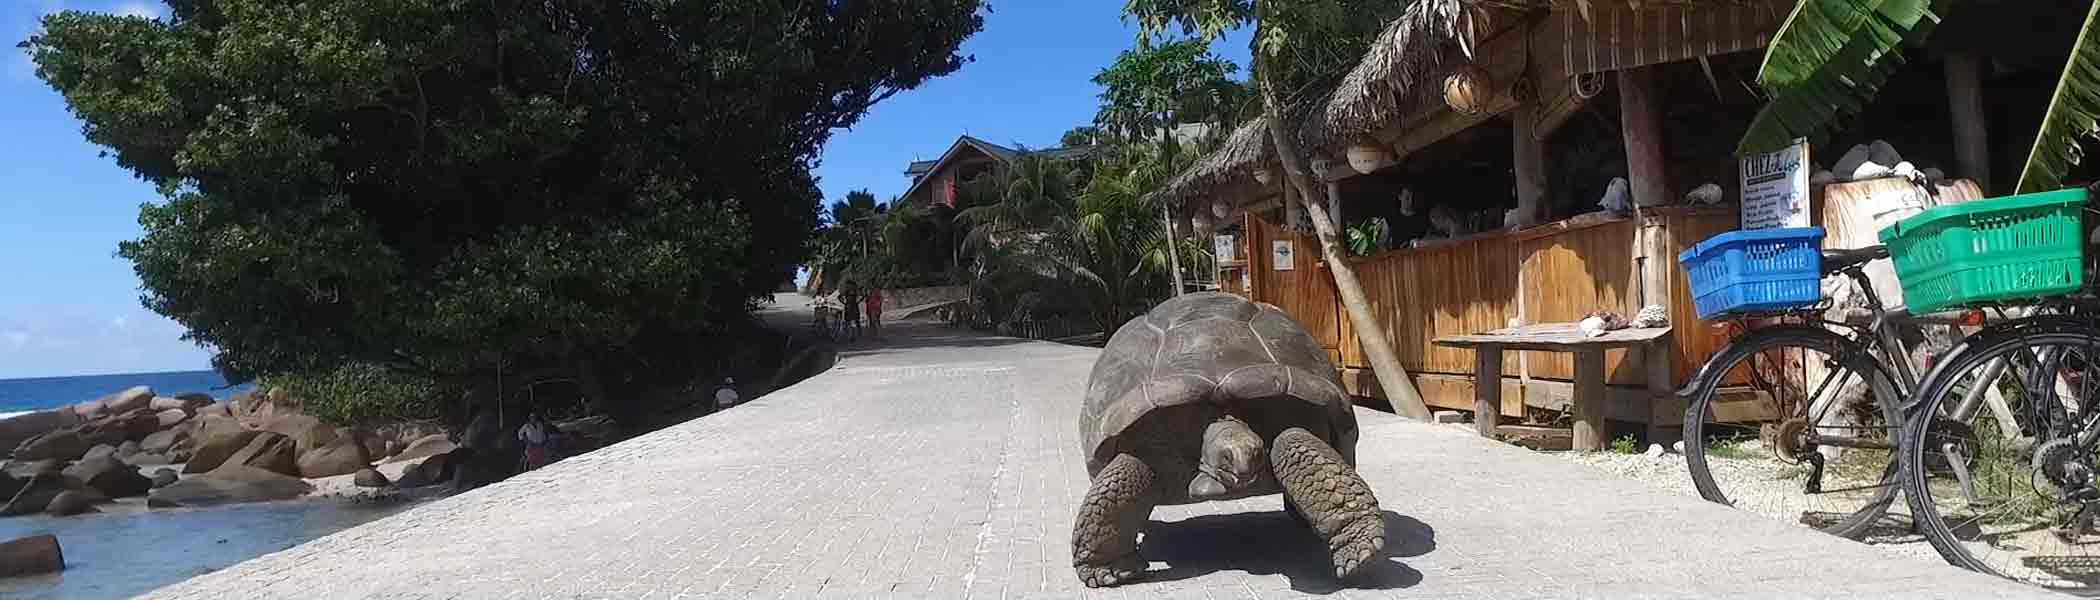 chez-jules, Bars and restaurants in Seychelles Islands